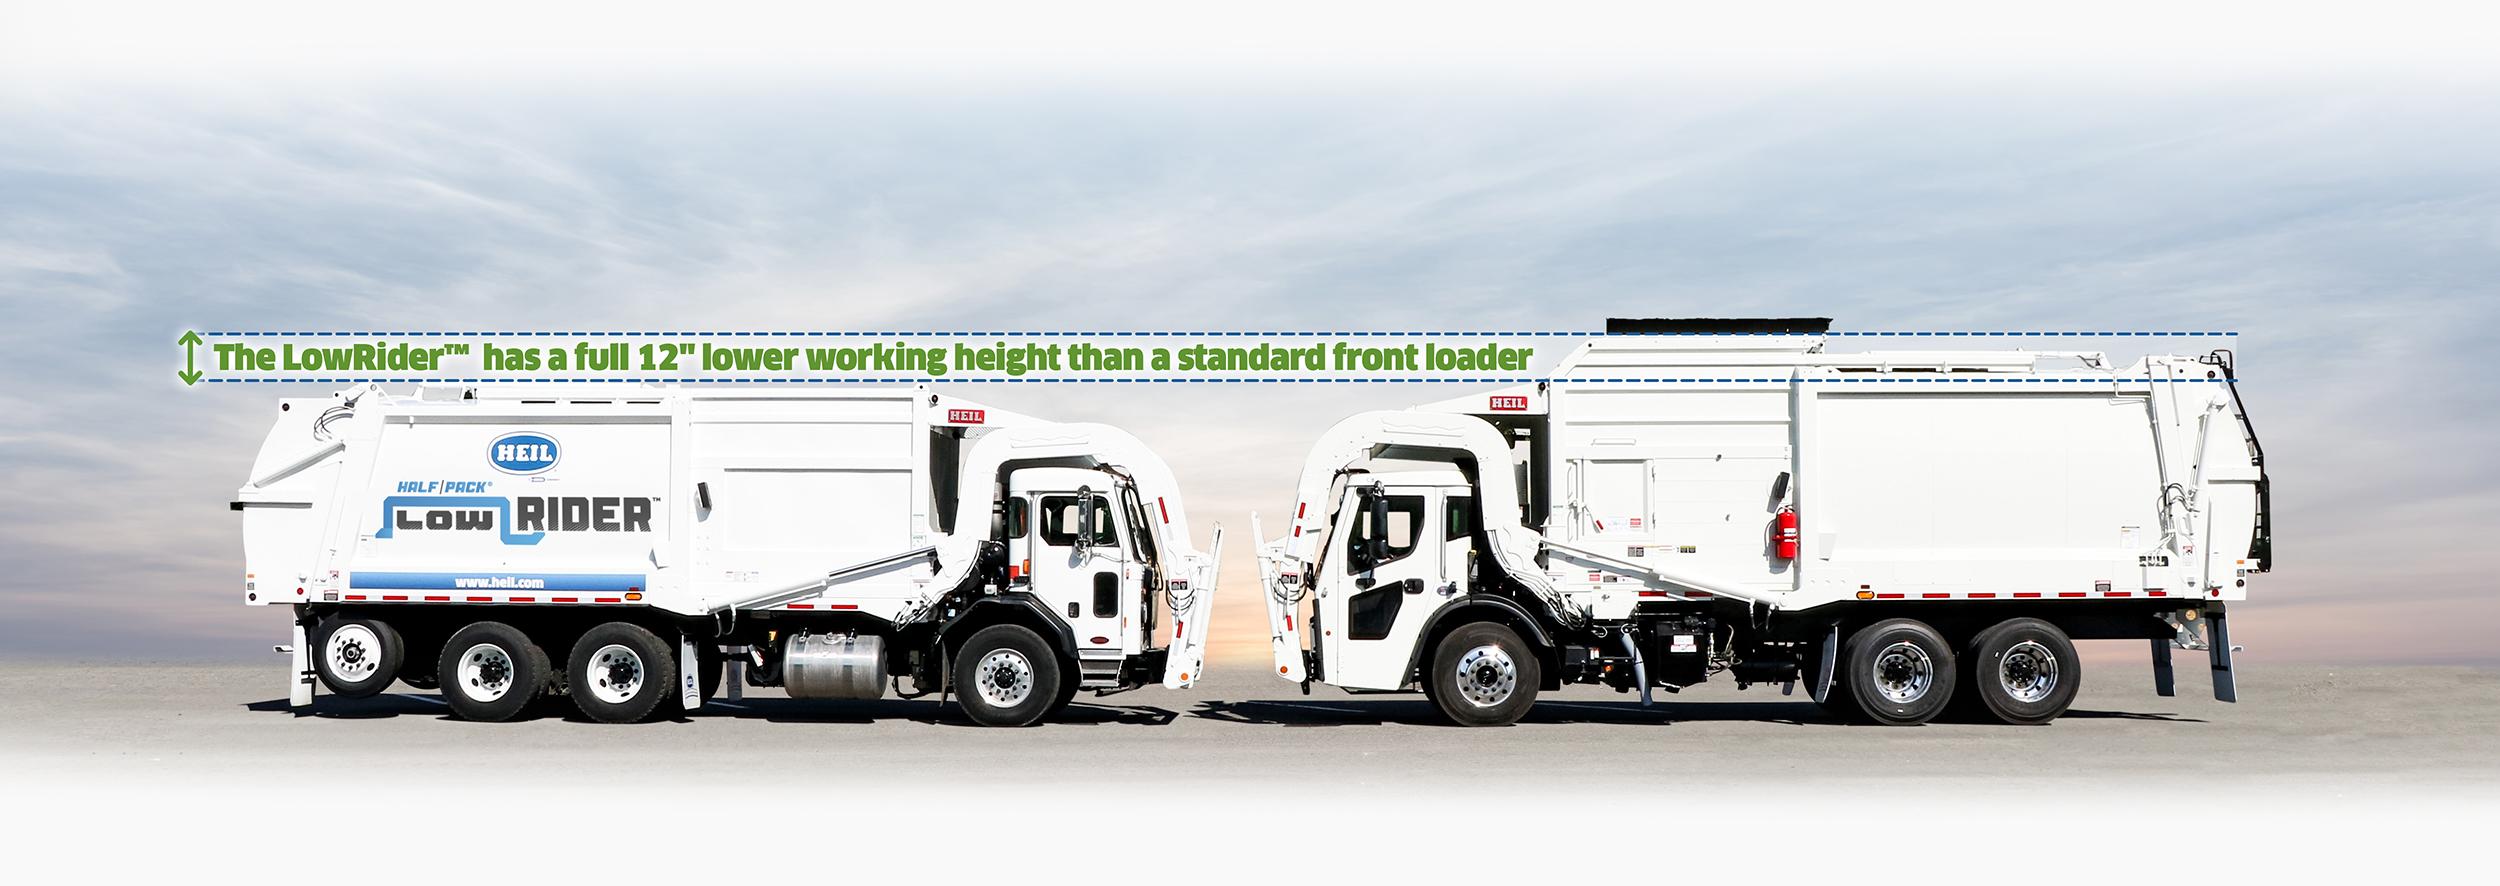 Lowrider Height Comparison